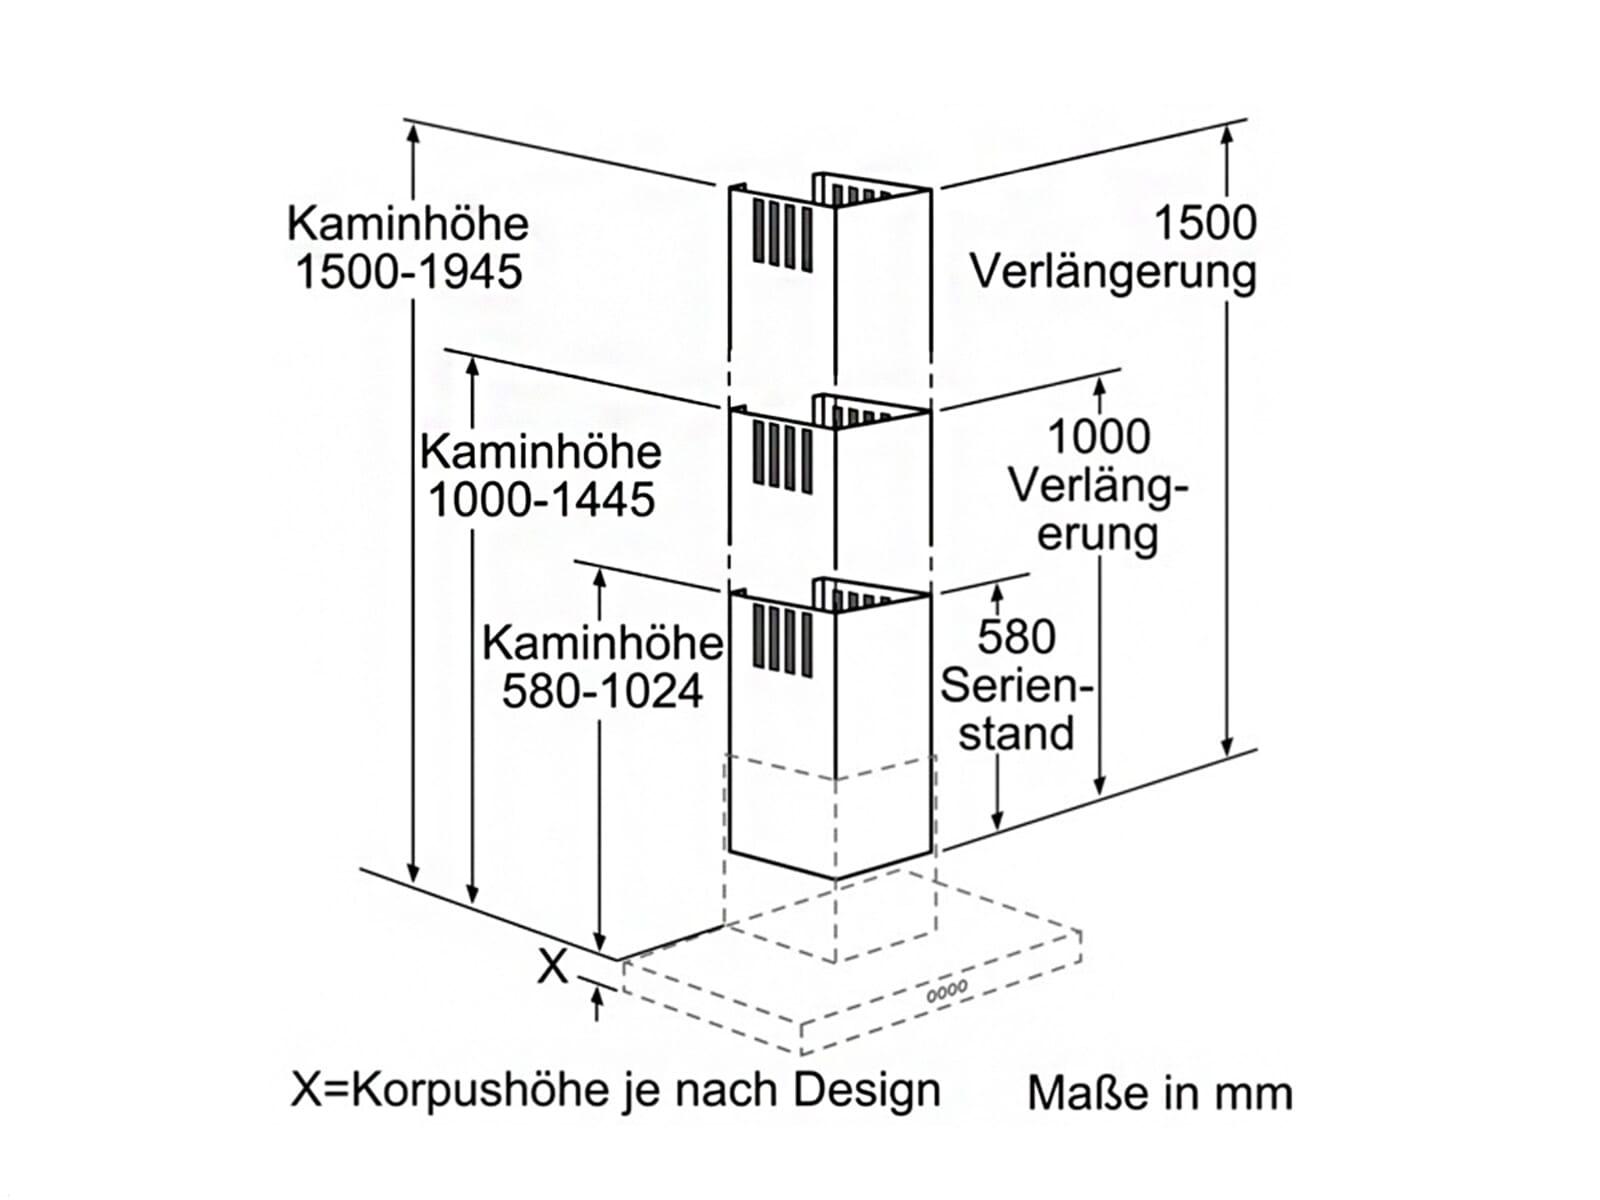 Siemens LZ12265 Kaminverlängerung 1000 mm